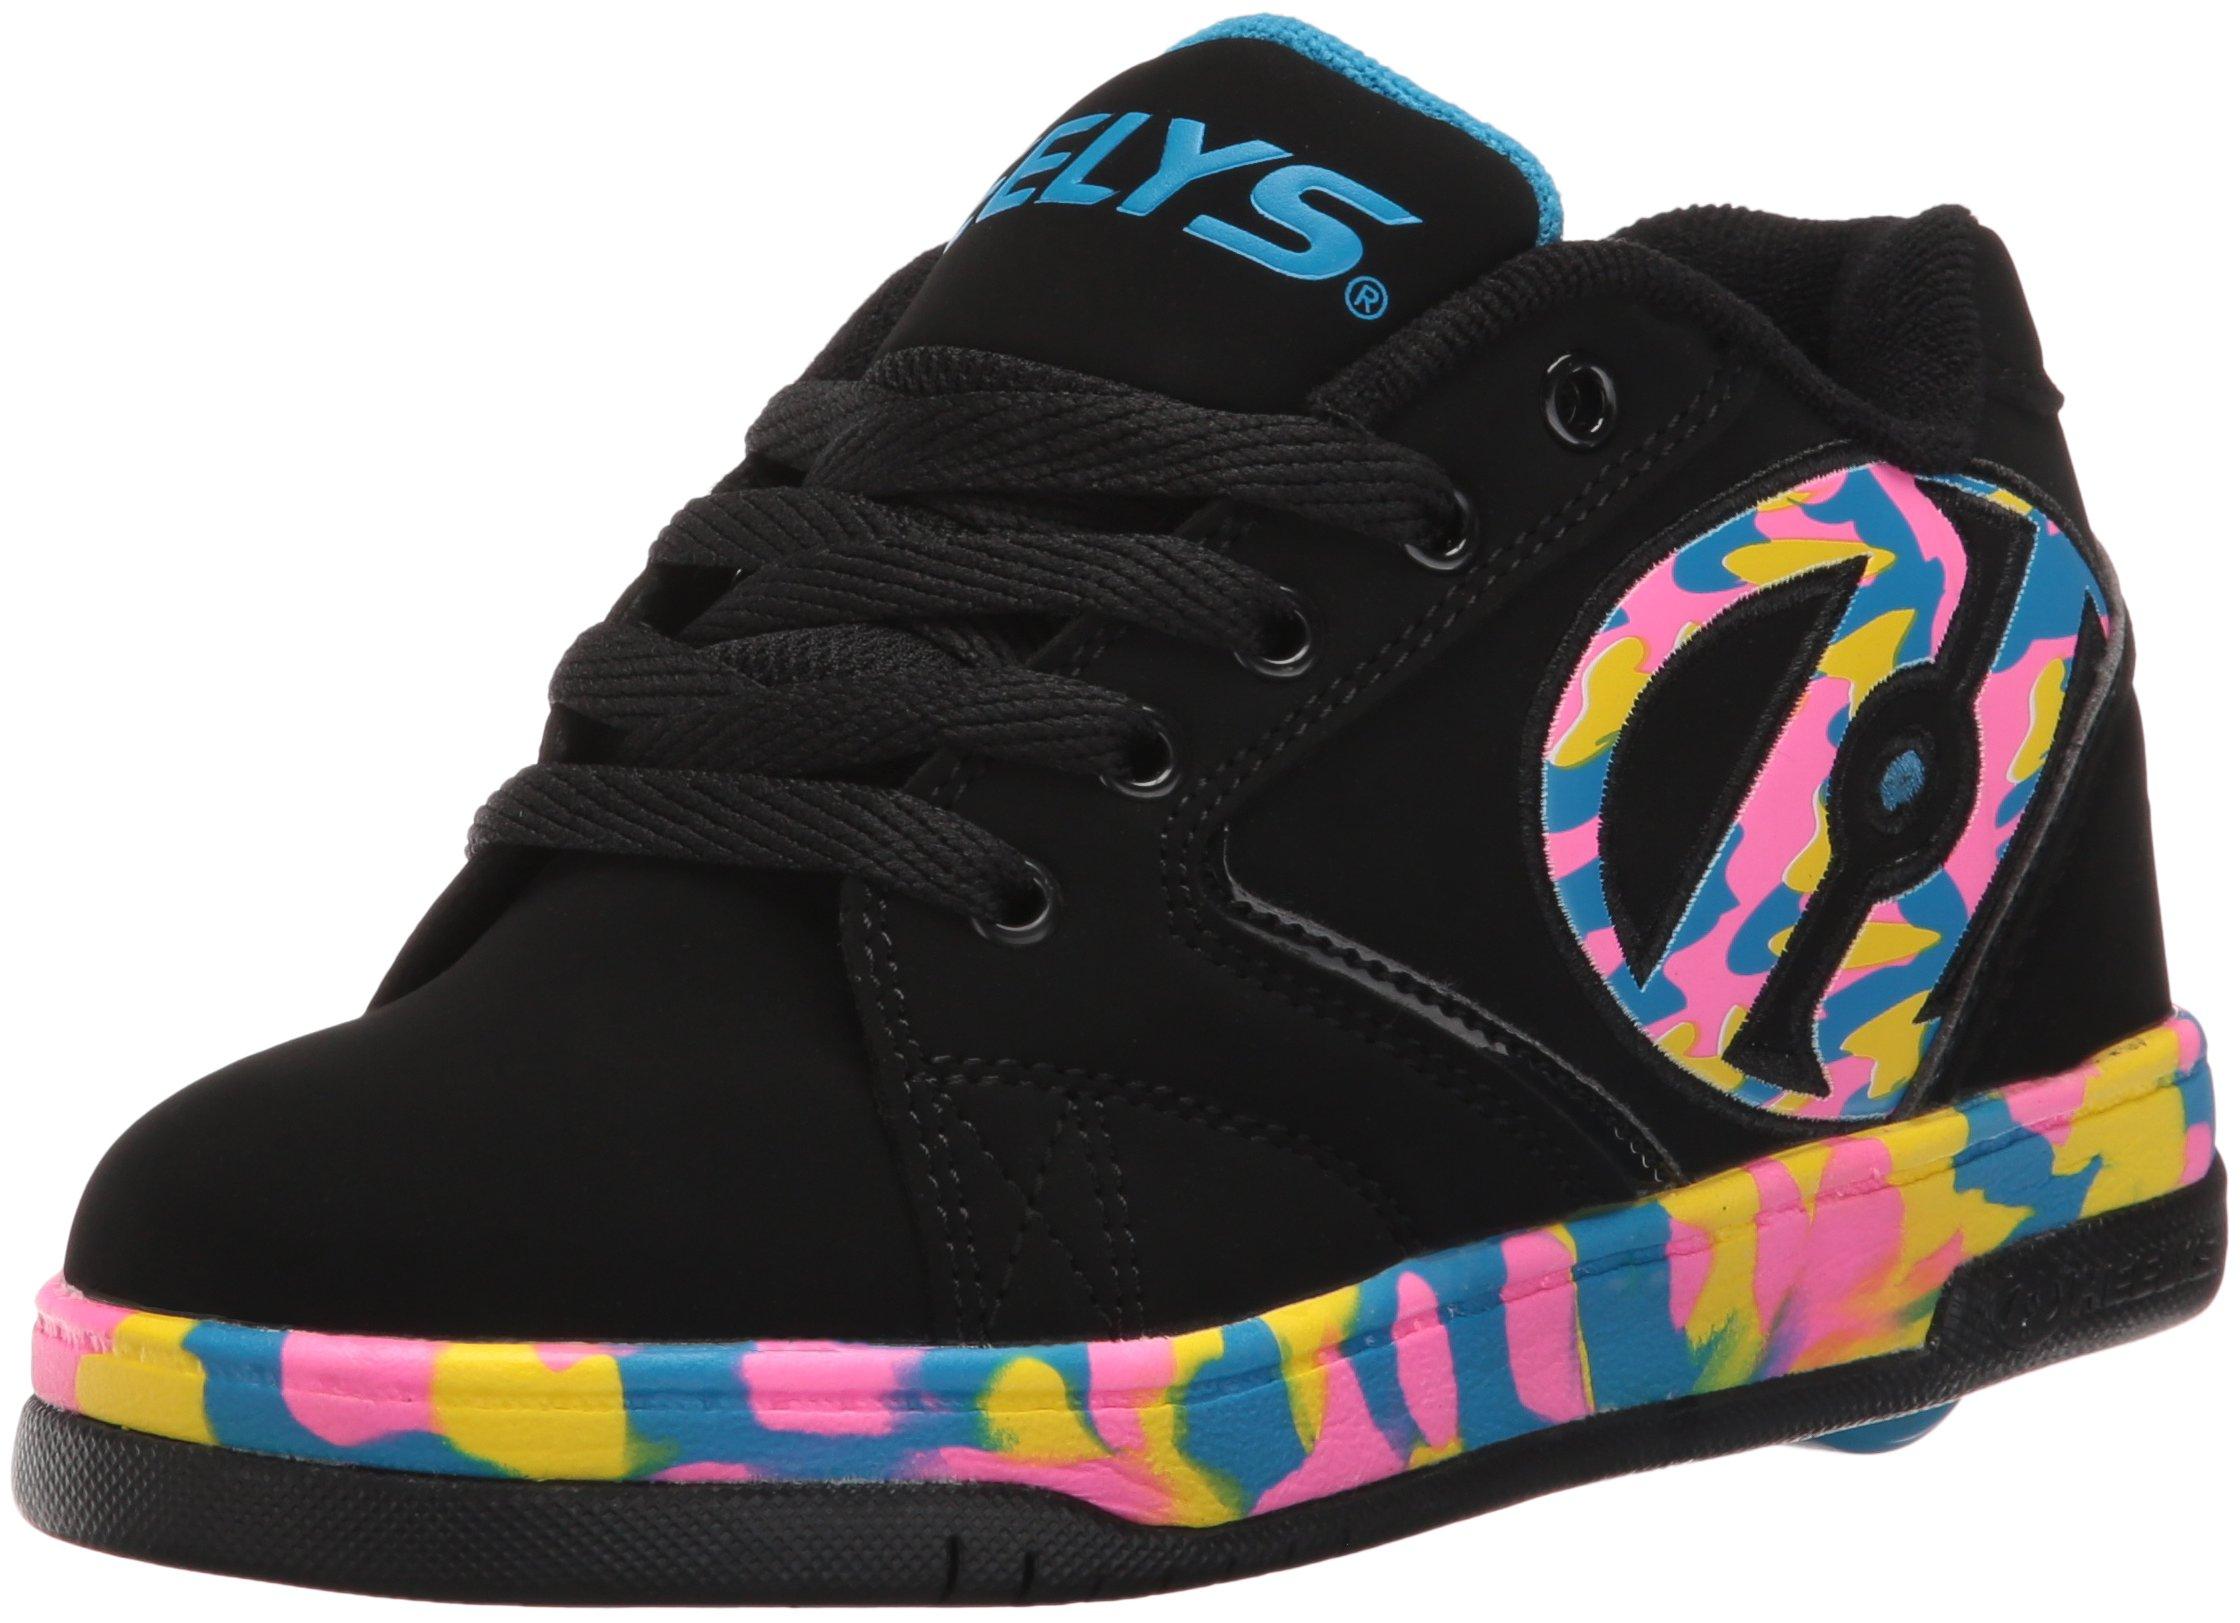 Heelys Propel 2.0 Men's Sneaker,Black/Pink/Blue Confetti,3 M US Big Kid